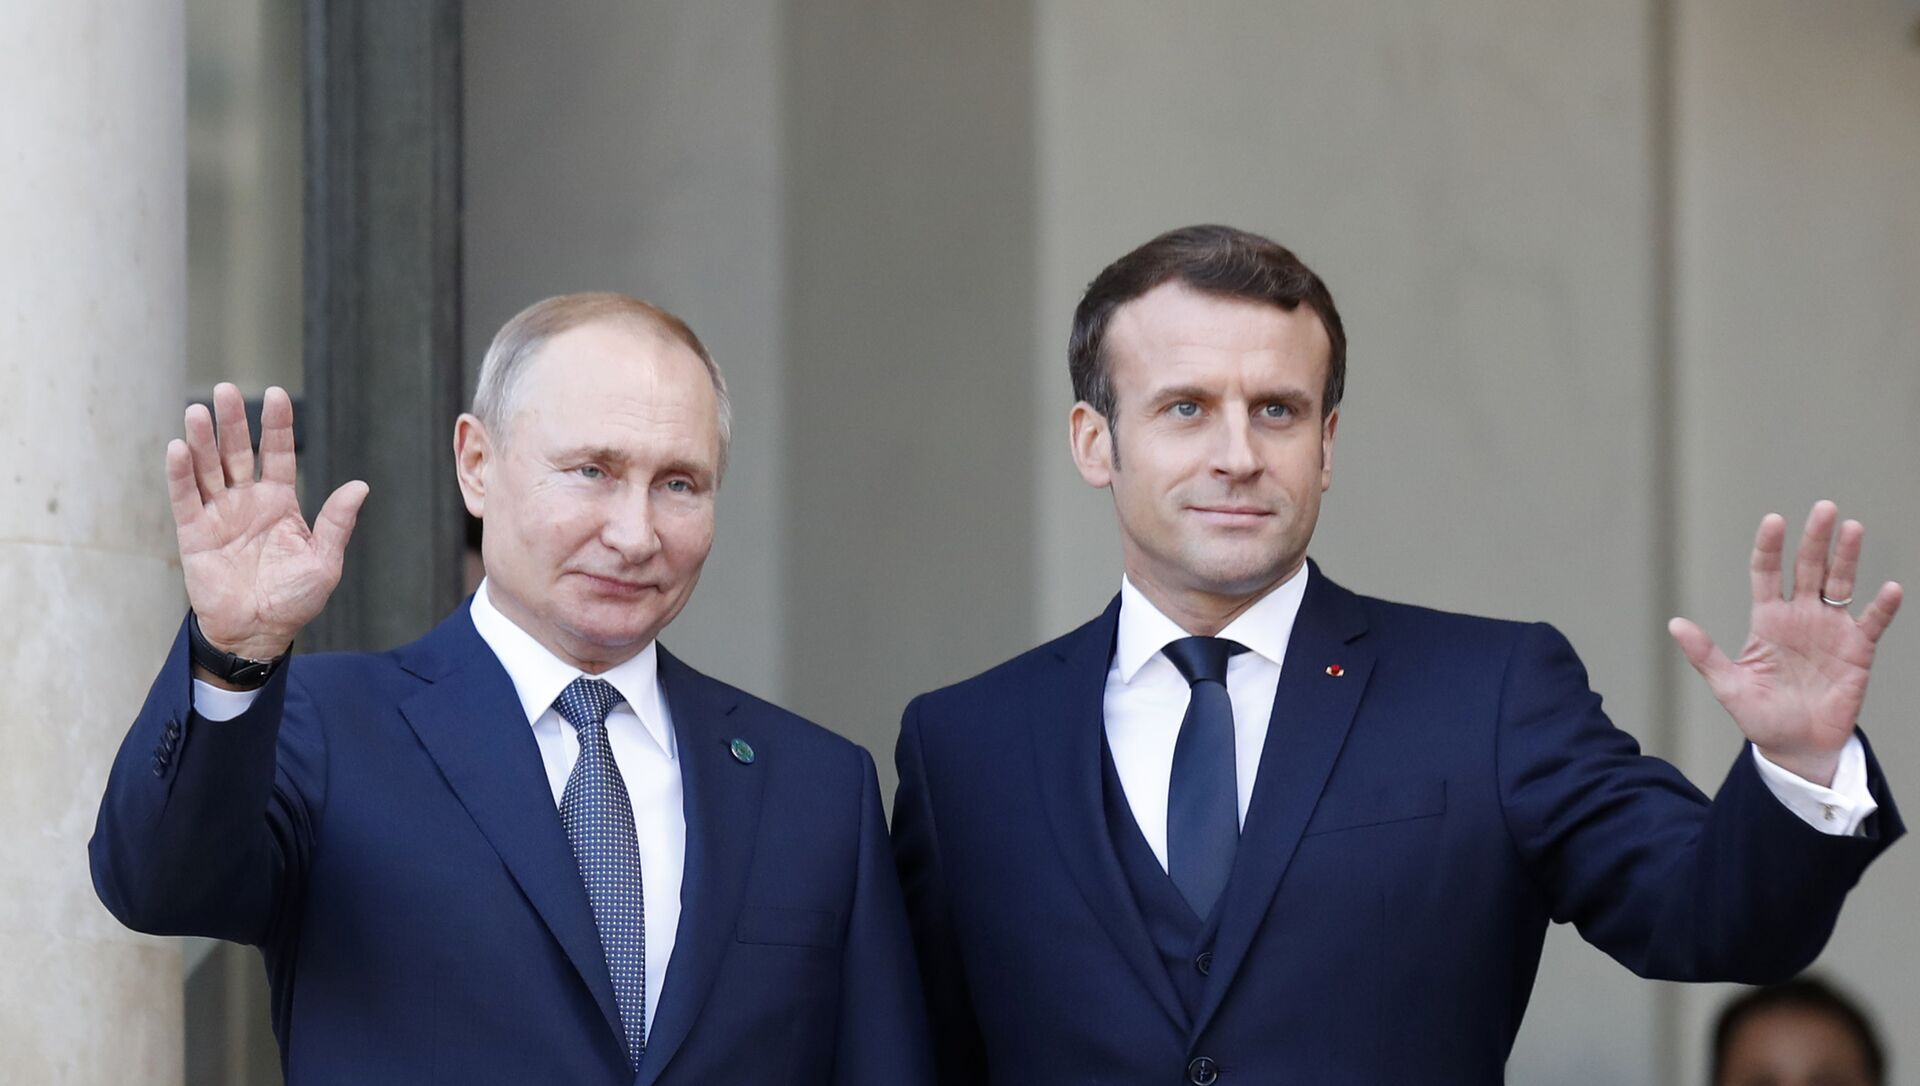 Vladimir Poutine et Emmanuel Macron - Sputnik France, 1920, 20.08.2021